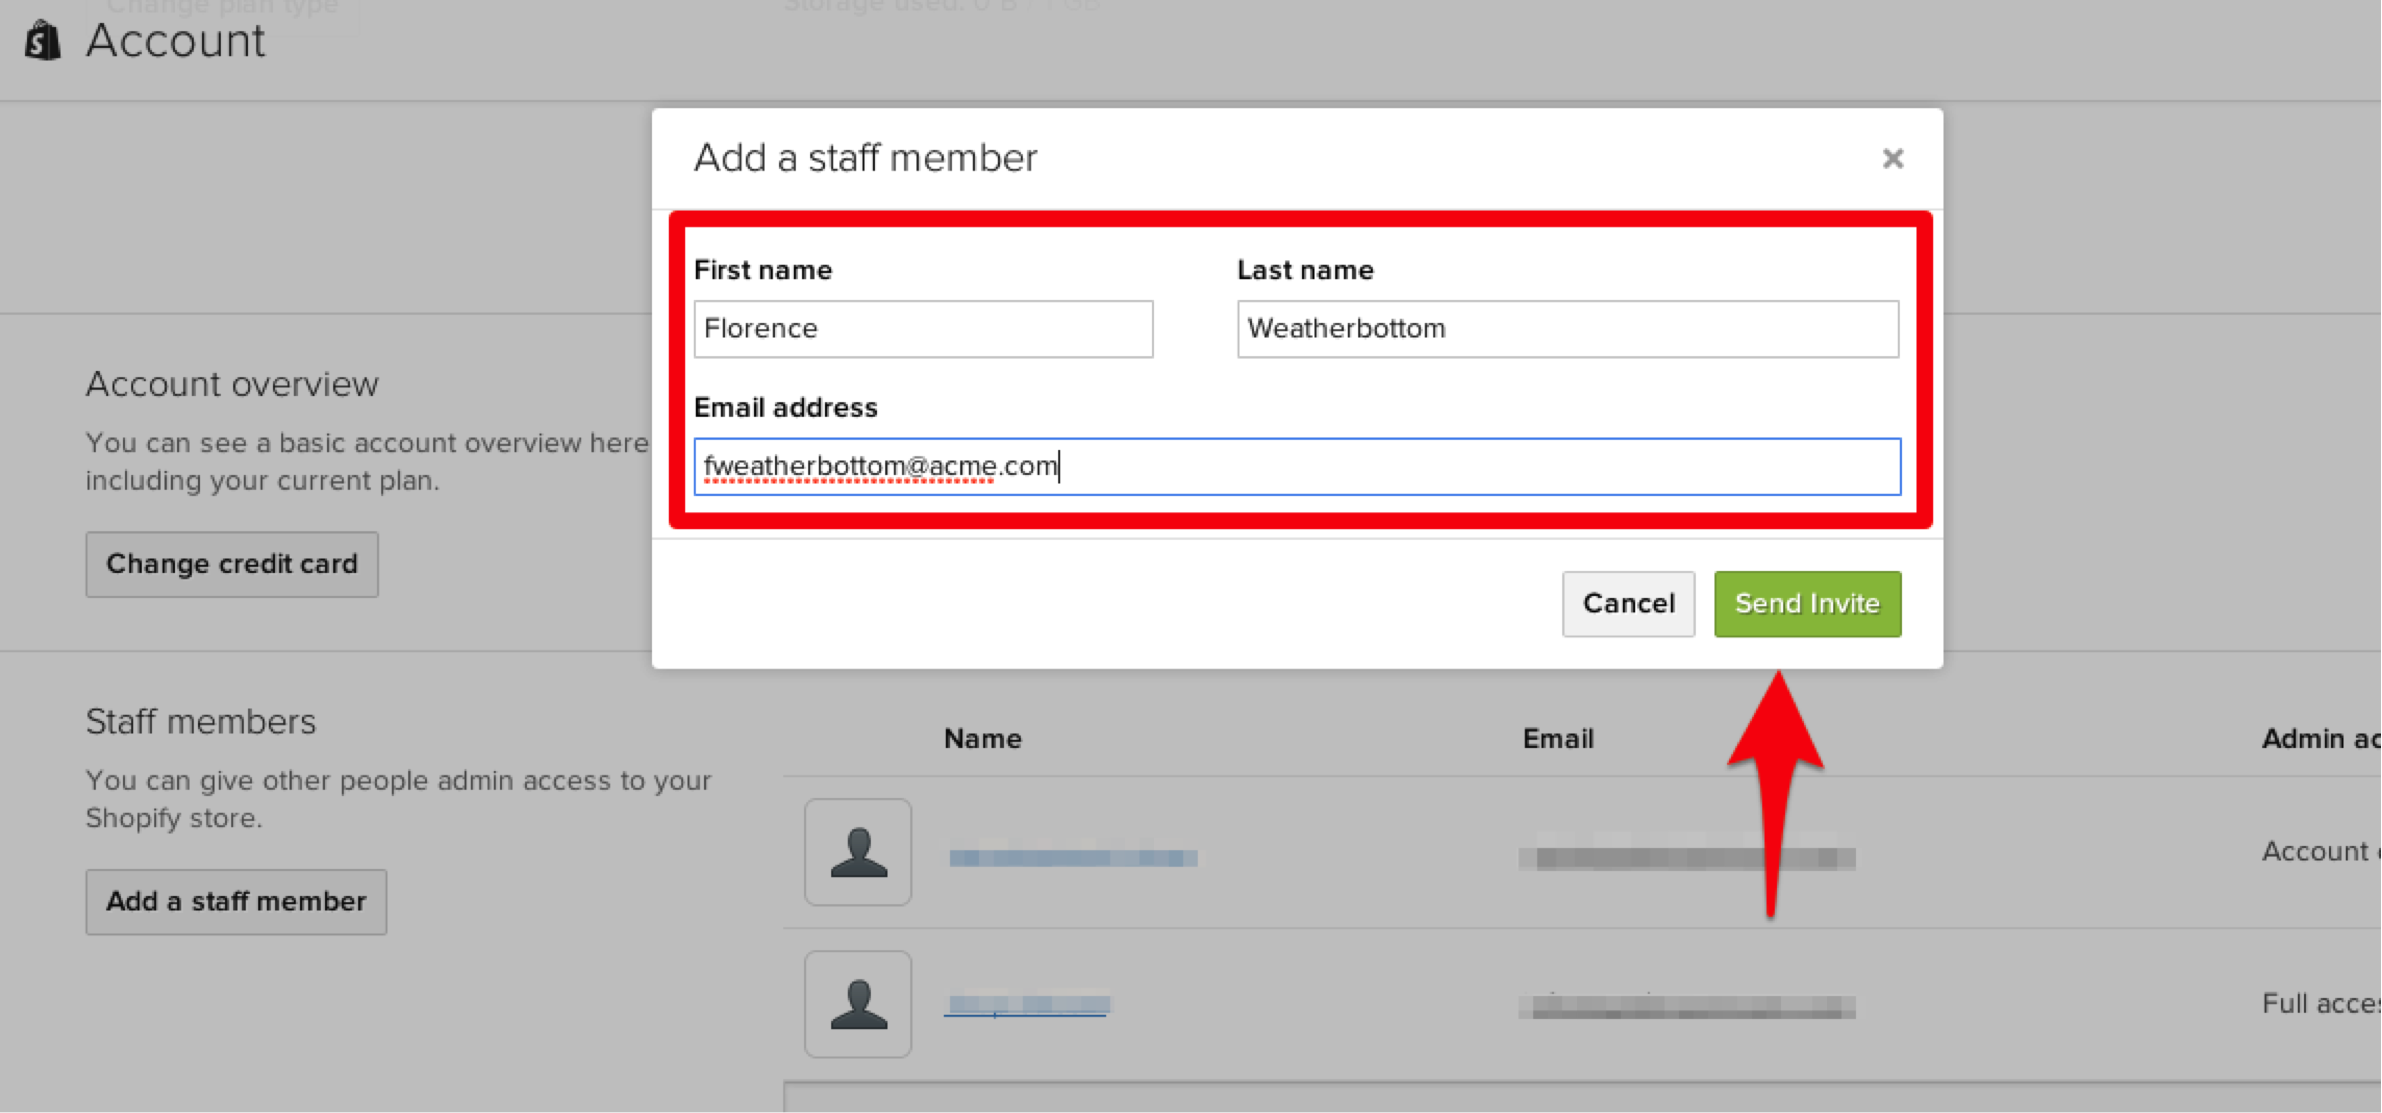 Add a Staff Member in Shopify